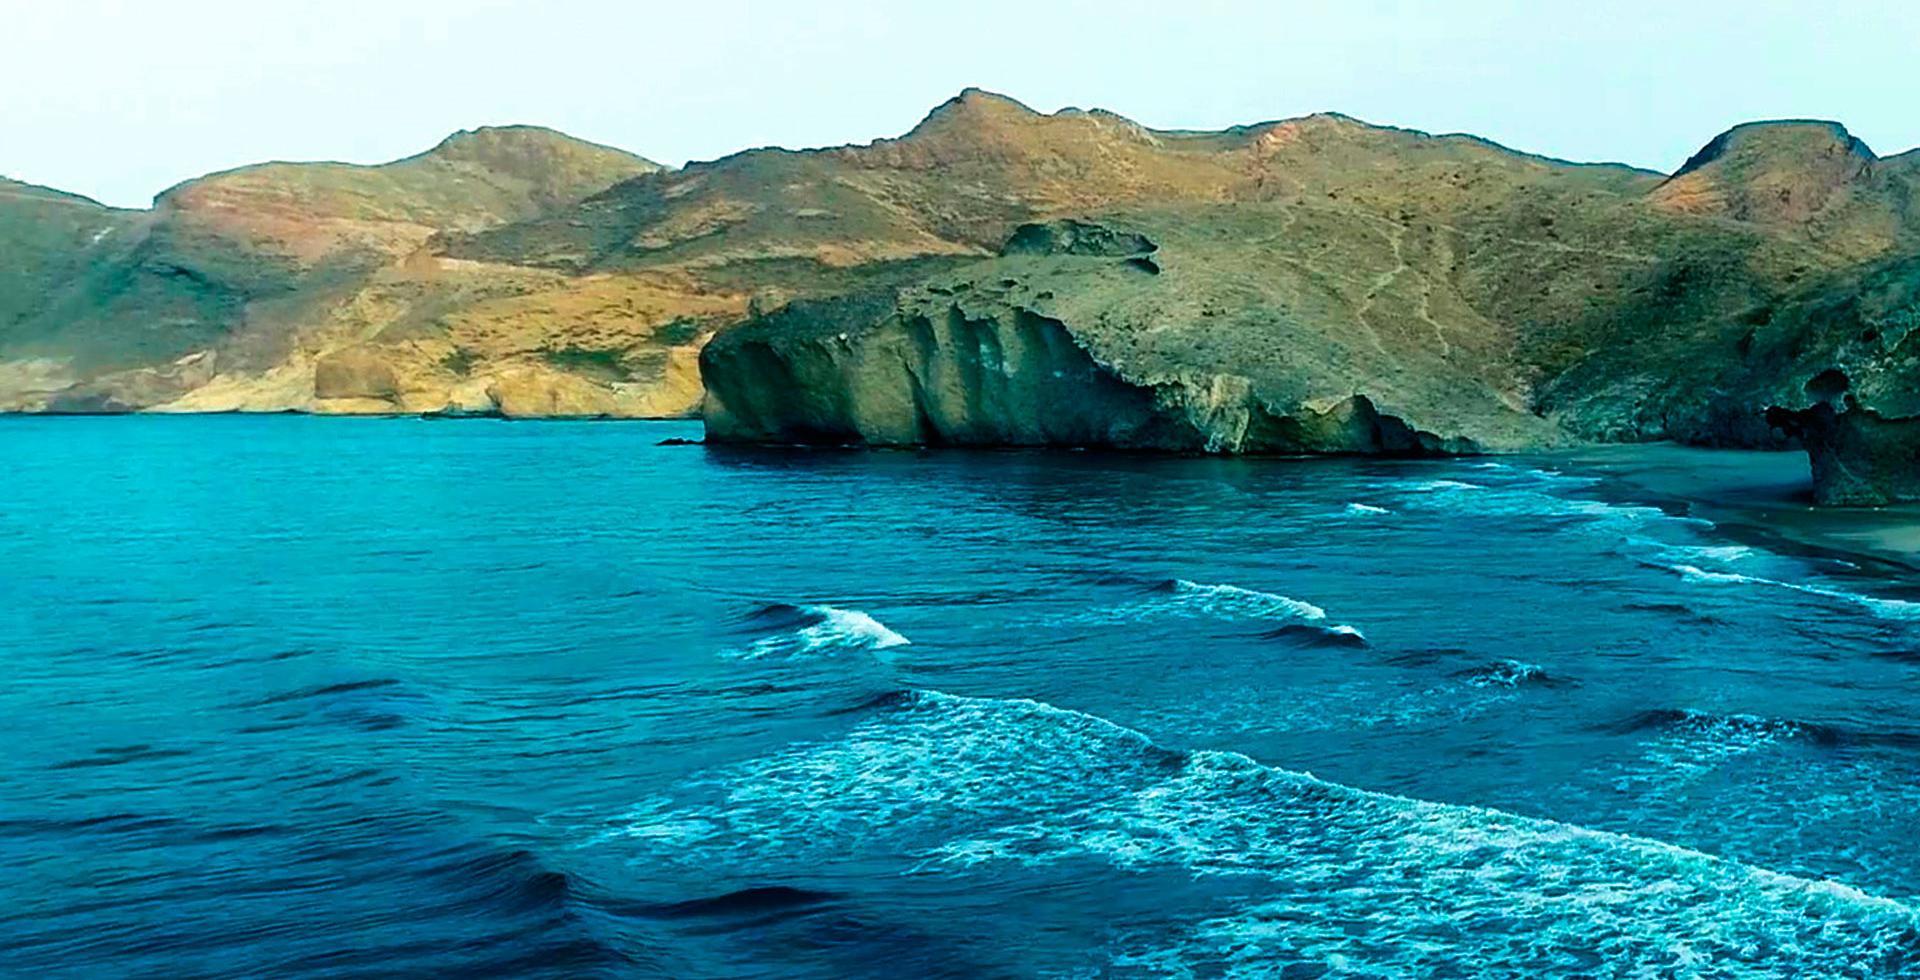 Cabo de Gata is Paradise